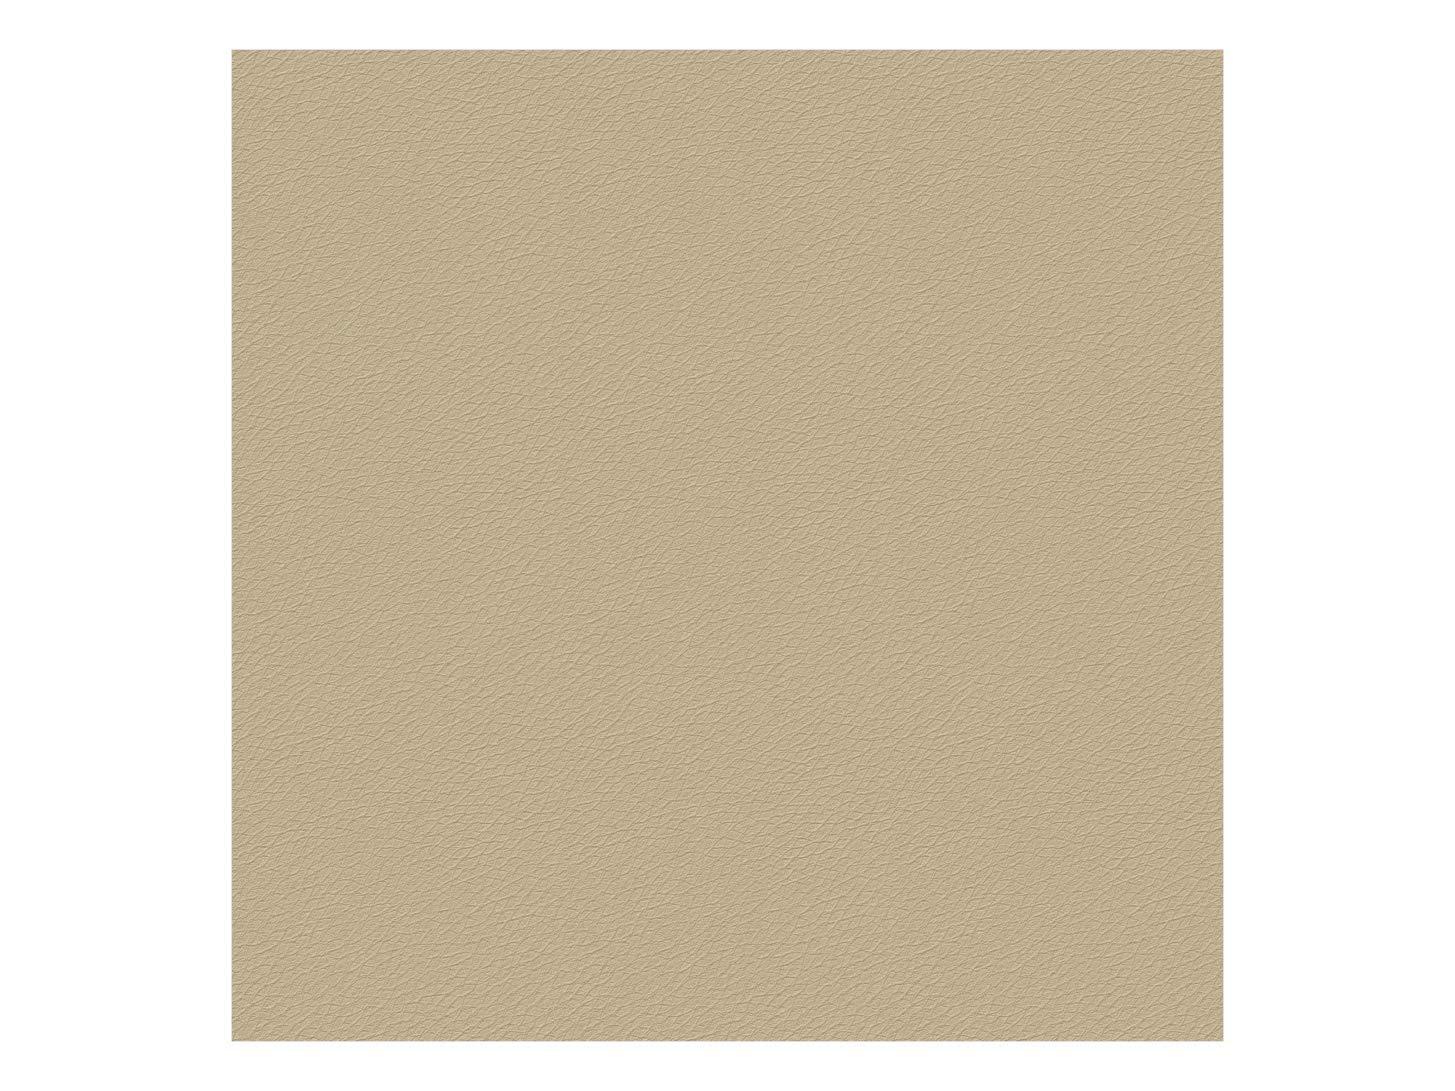 LA WEB DEL COLCHON Polipiel para tapizar 0,5 ML Ancho 70 cms. Color Beige Polipiel